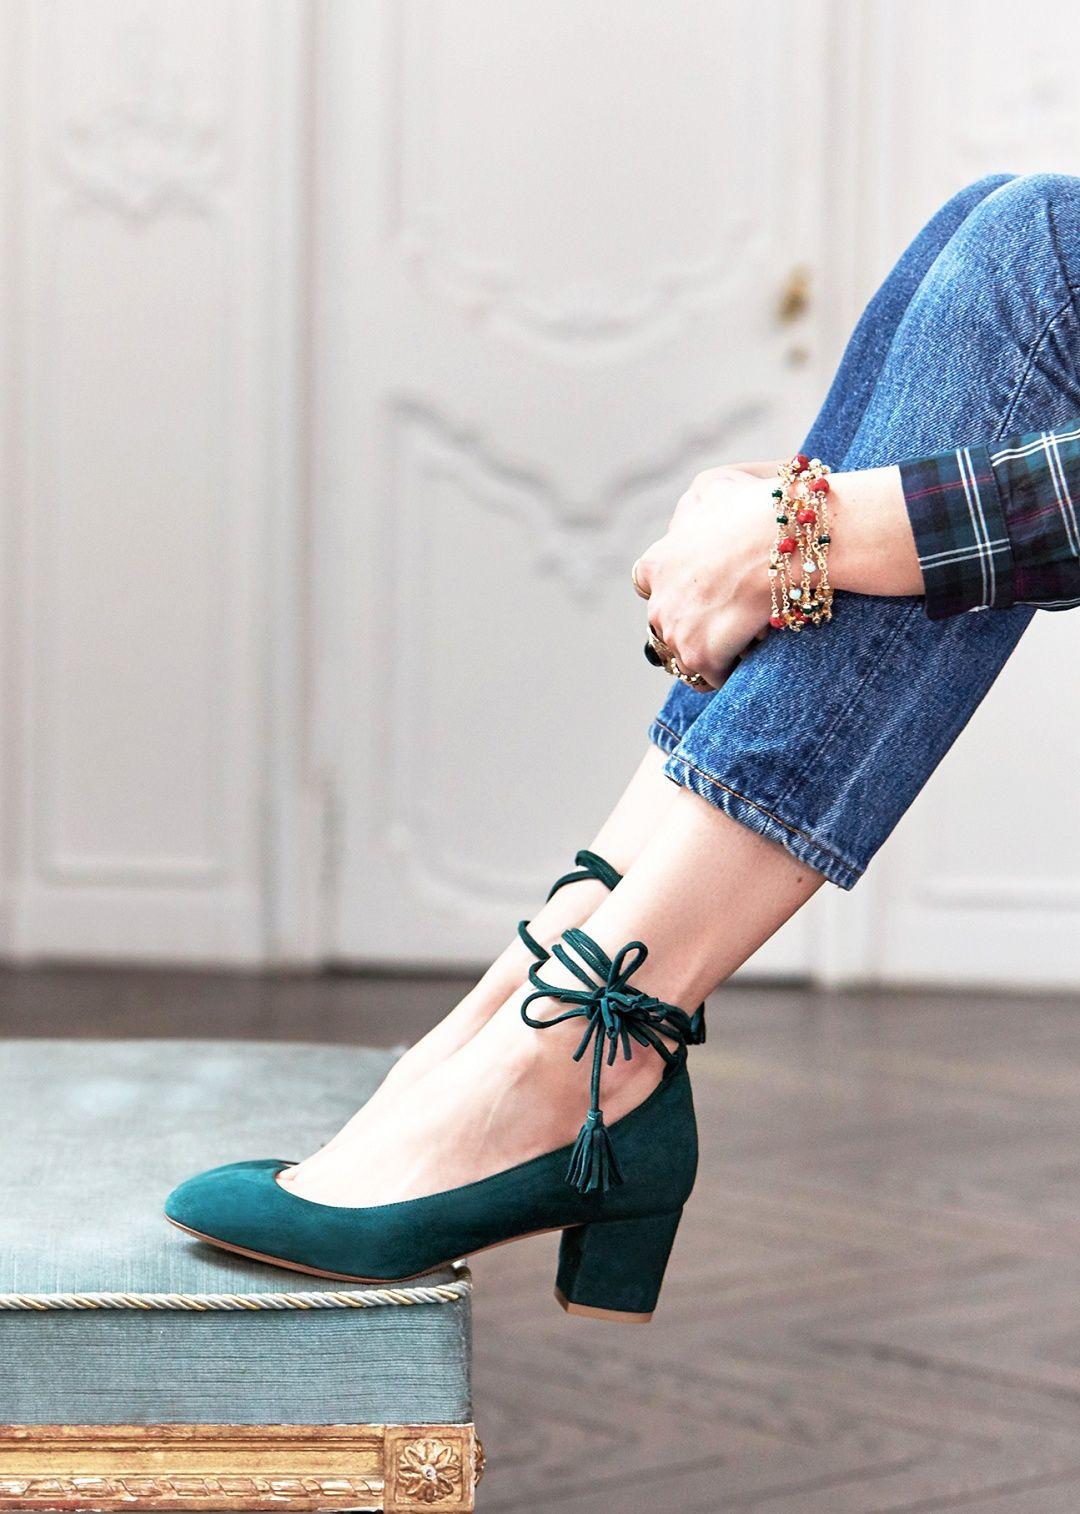 Zapatos Los Pumps Pies Strapped Sezane Mis Valentina Y R1IwvxUq